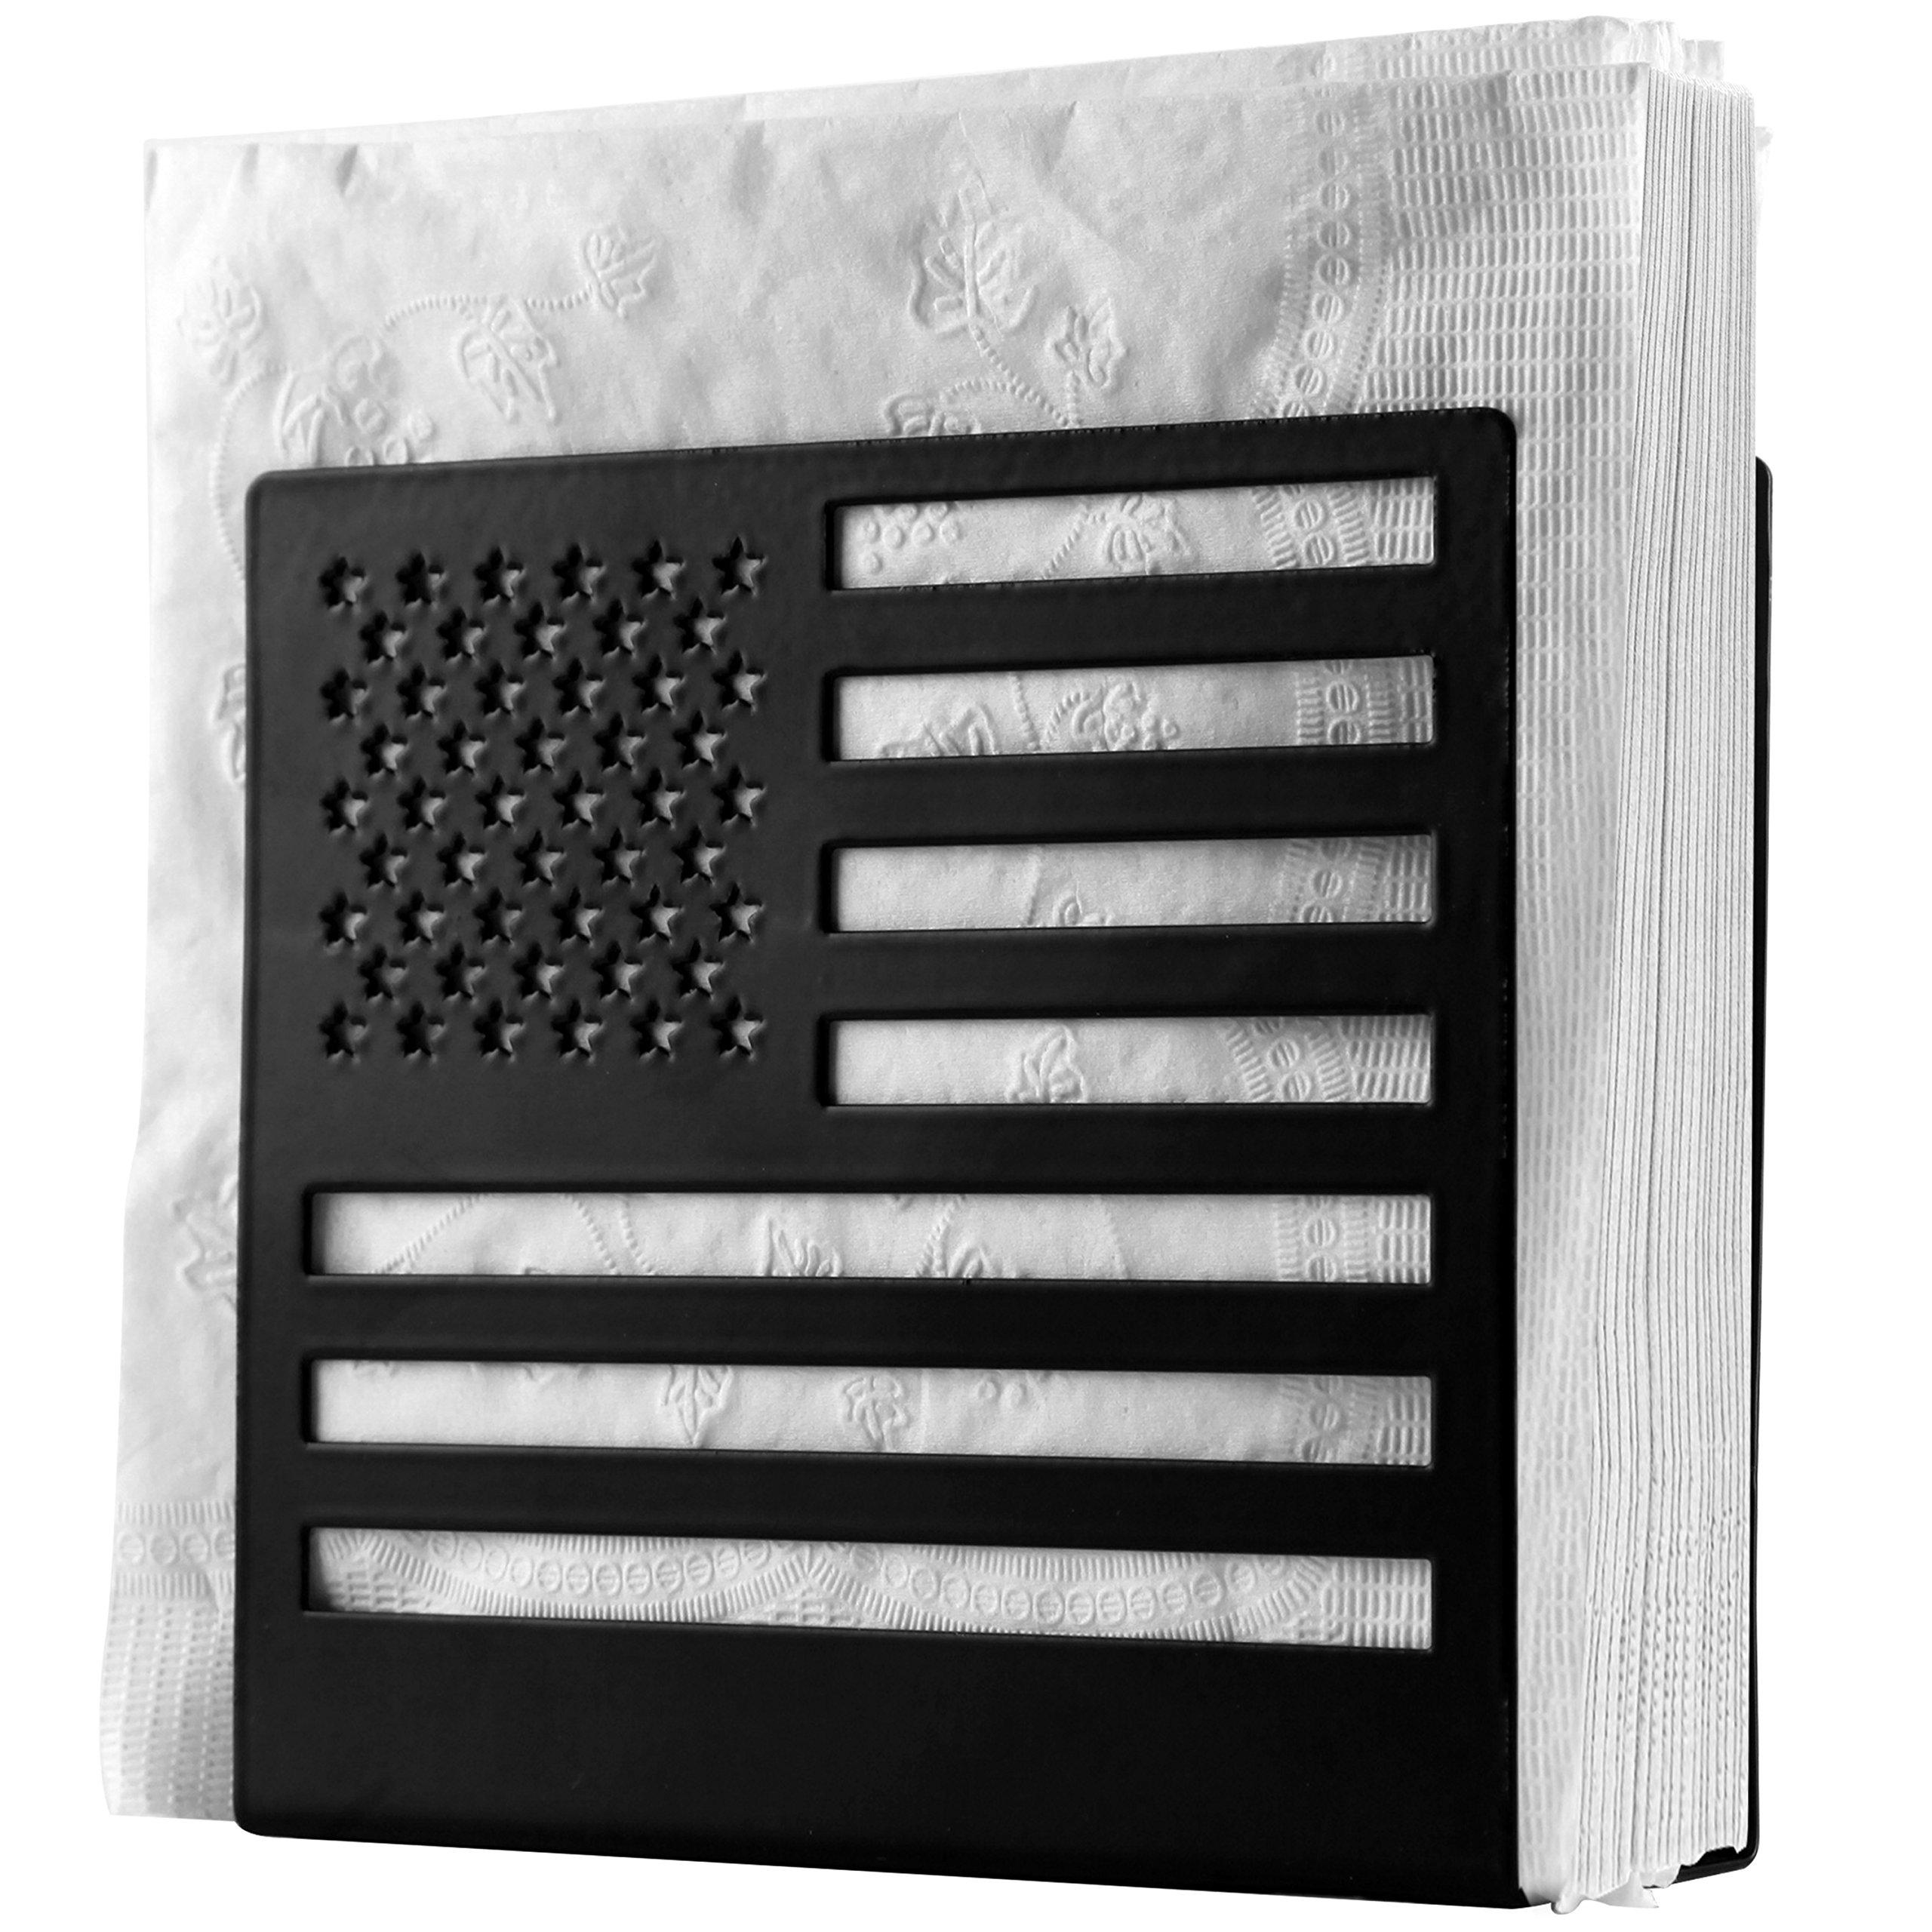 Black Metal American Flag Cut-out Design Tabletop Paper Napkin Holder, Freestanding Tissue Dispenser by MyGift